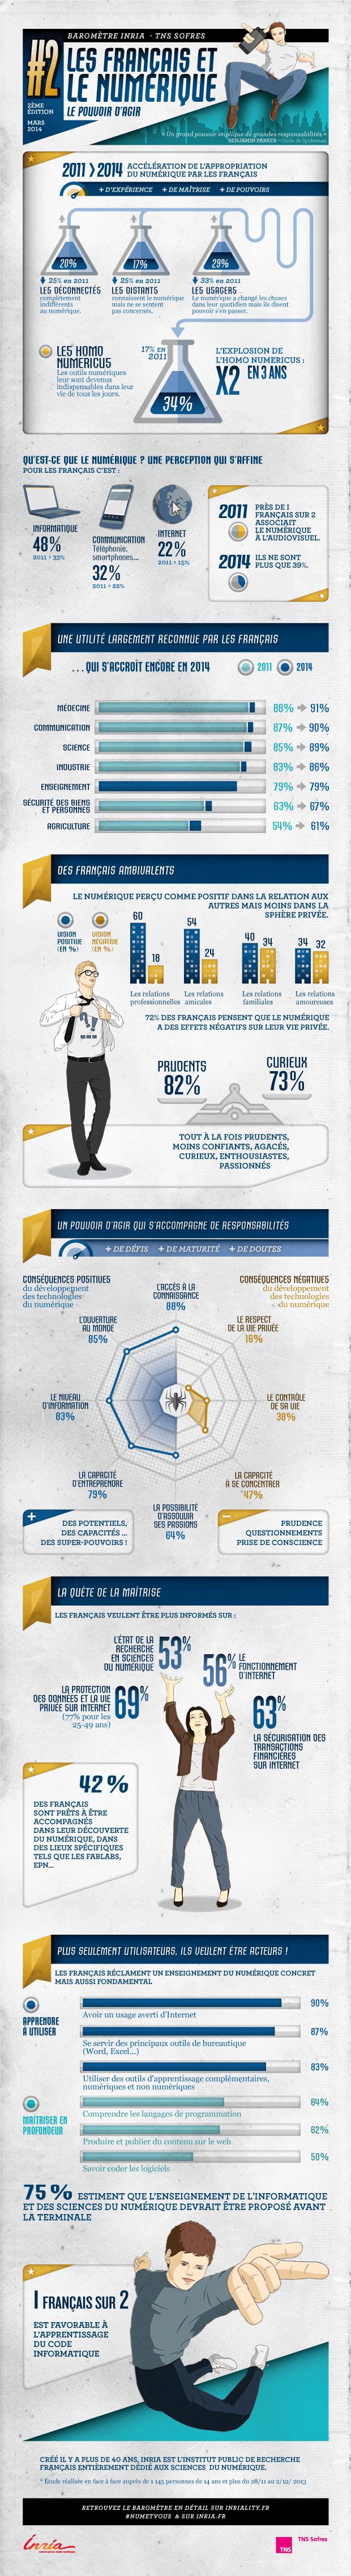 Barometre2014_Infographie_socle